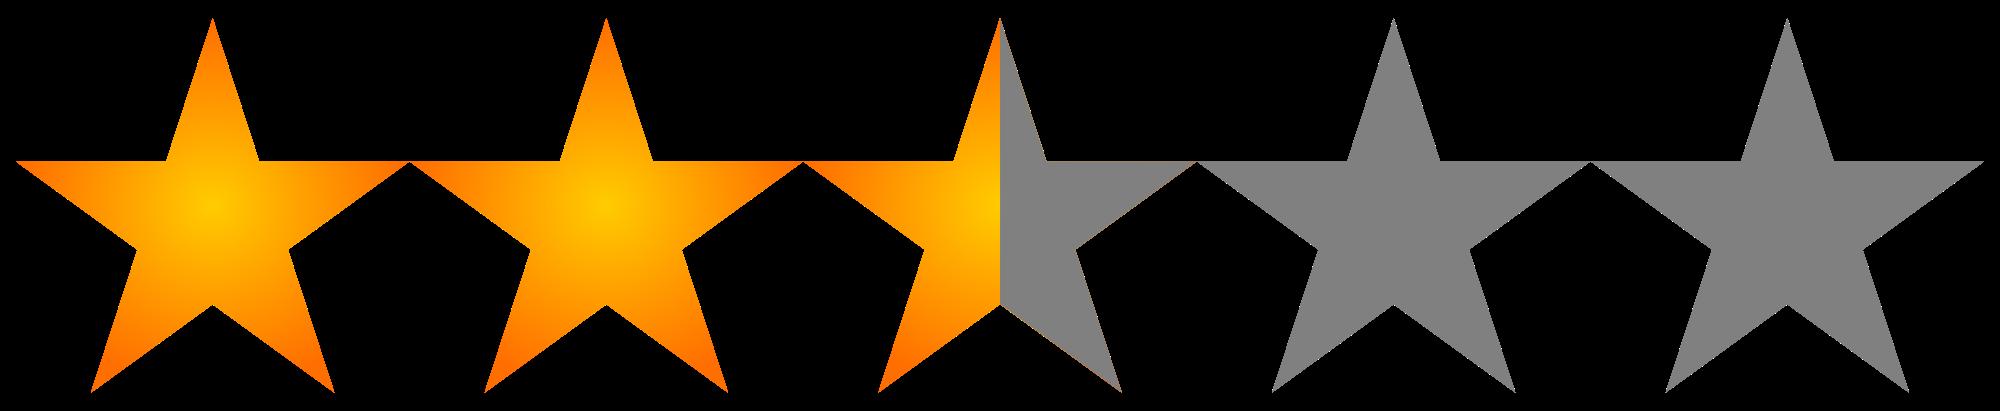 2000px-2.5_stars.svg